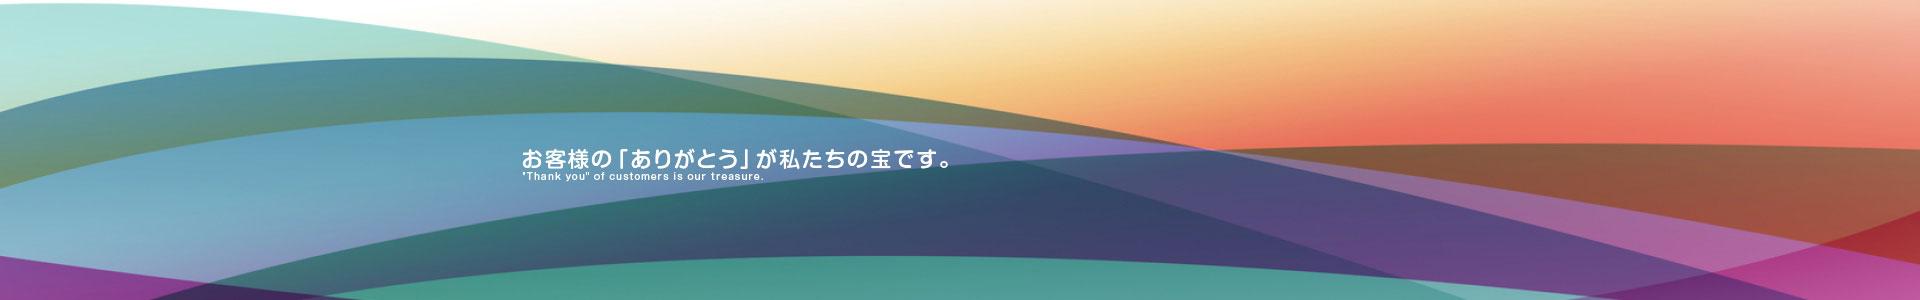 top_slider01